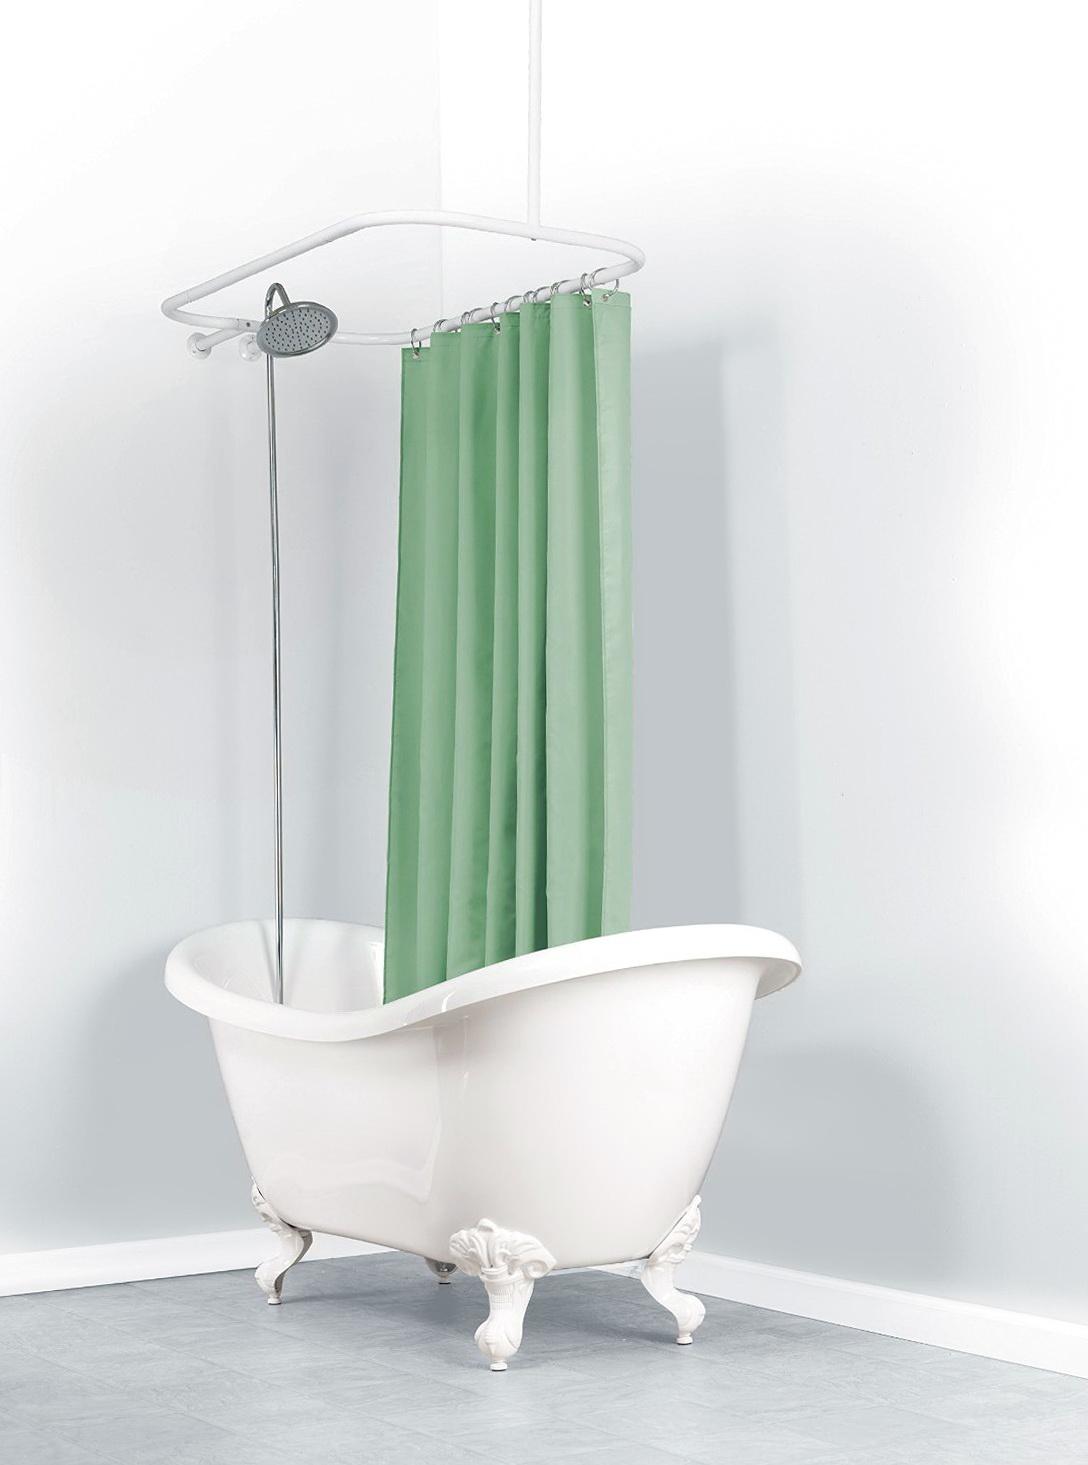 Oval Shower Curtain Rod Canada